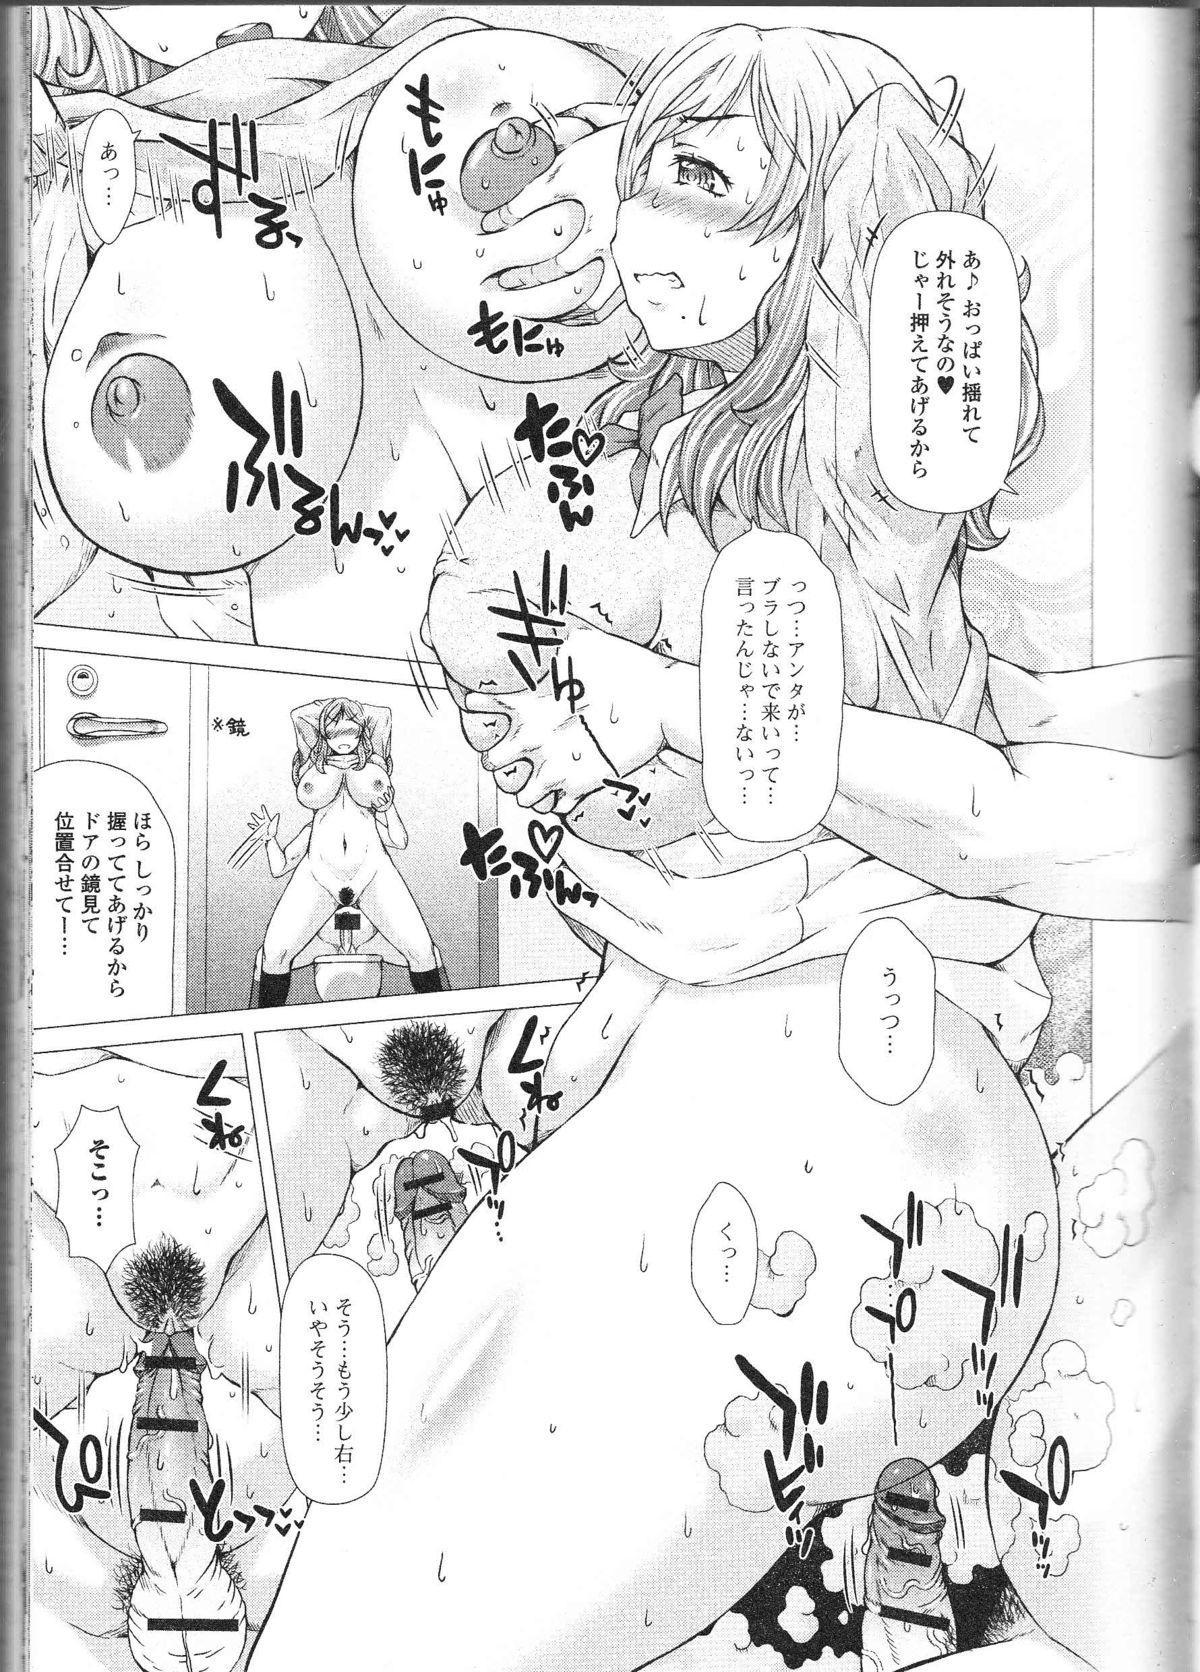 Nozoite wa Ikenai 9 - Do Not Peep! 9 37